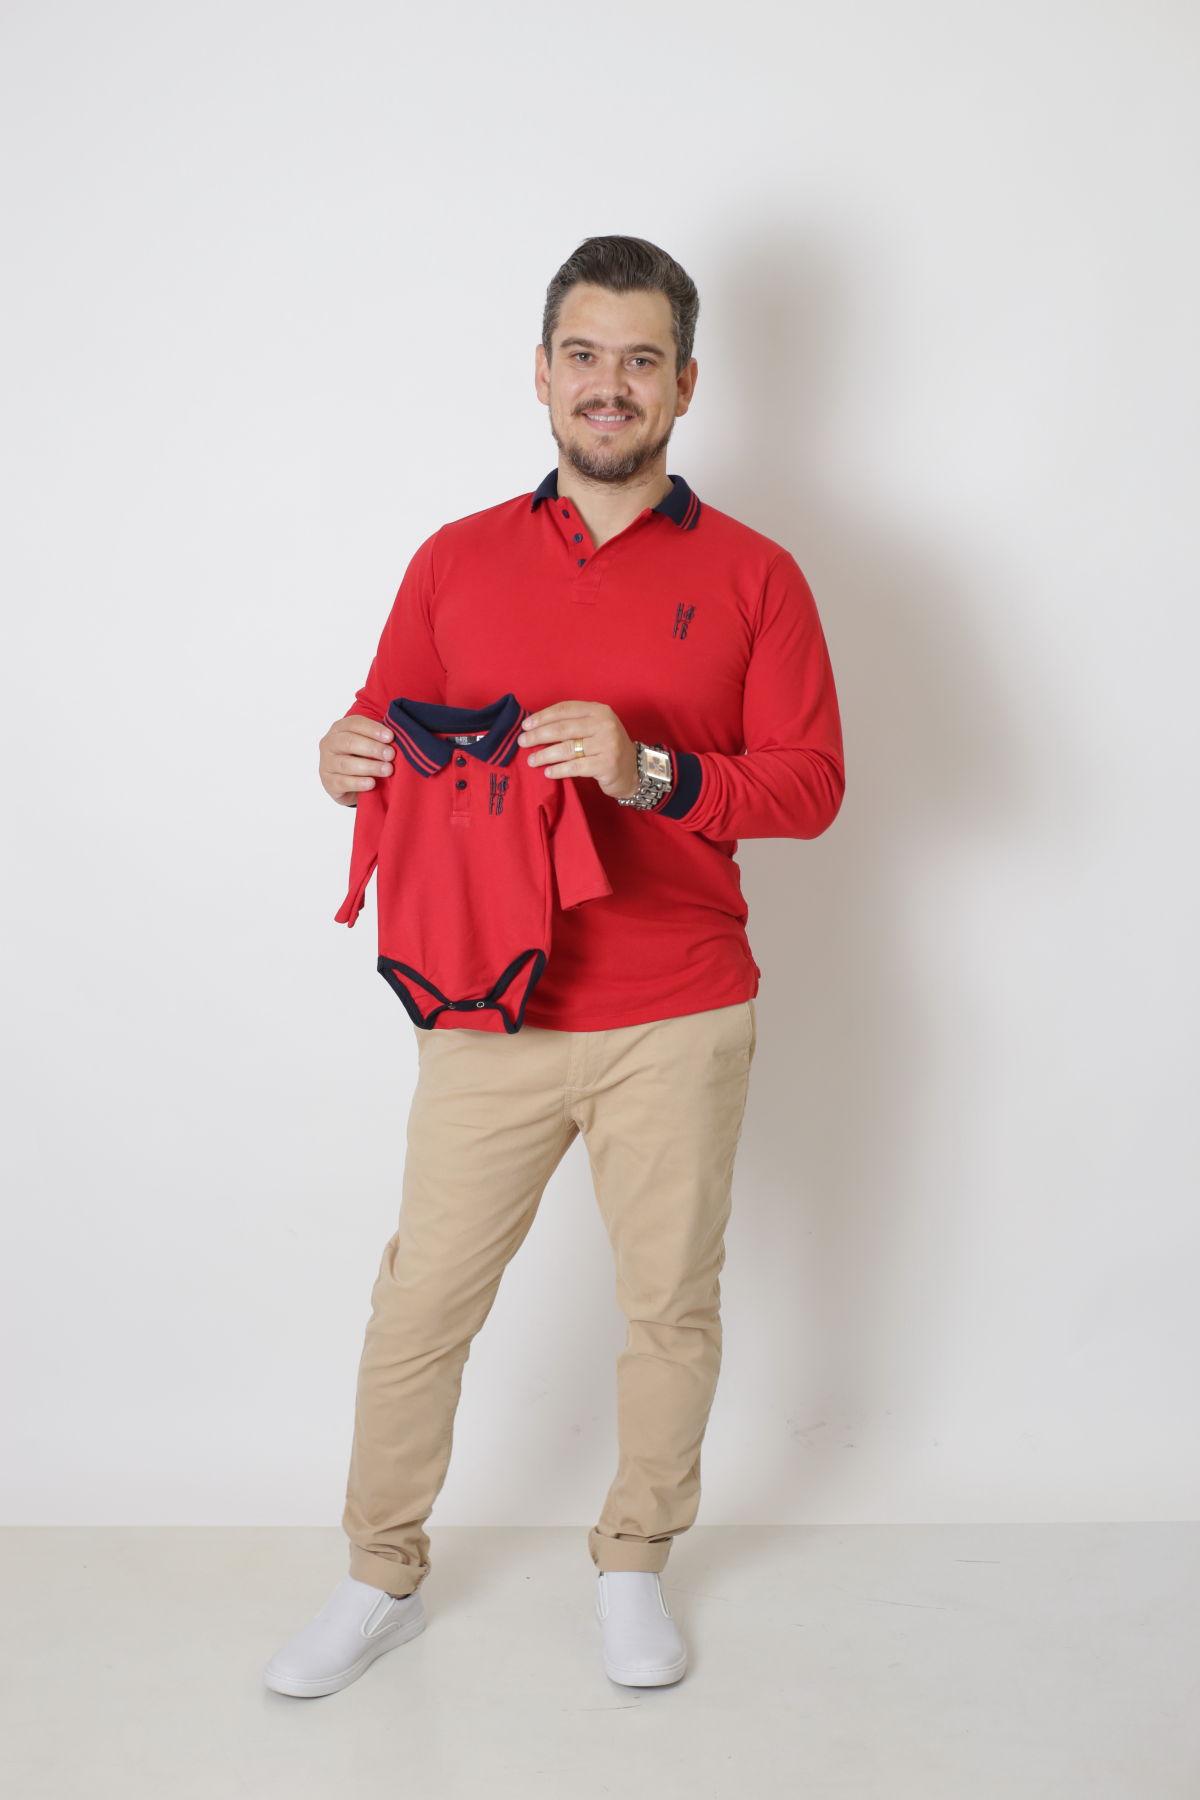 PAI E FILHO > Kit 02 Camisas Polos  ou Body Infantil Vermelho Manga Longa [Coleção Tal Pai Tal Filho]  - Heitor Fashion Brazil